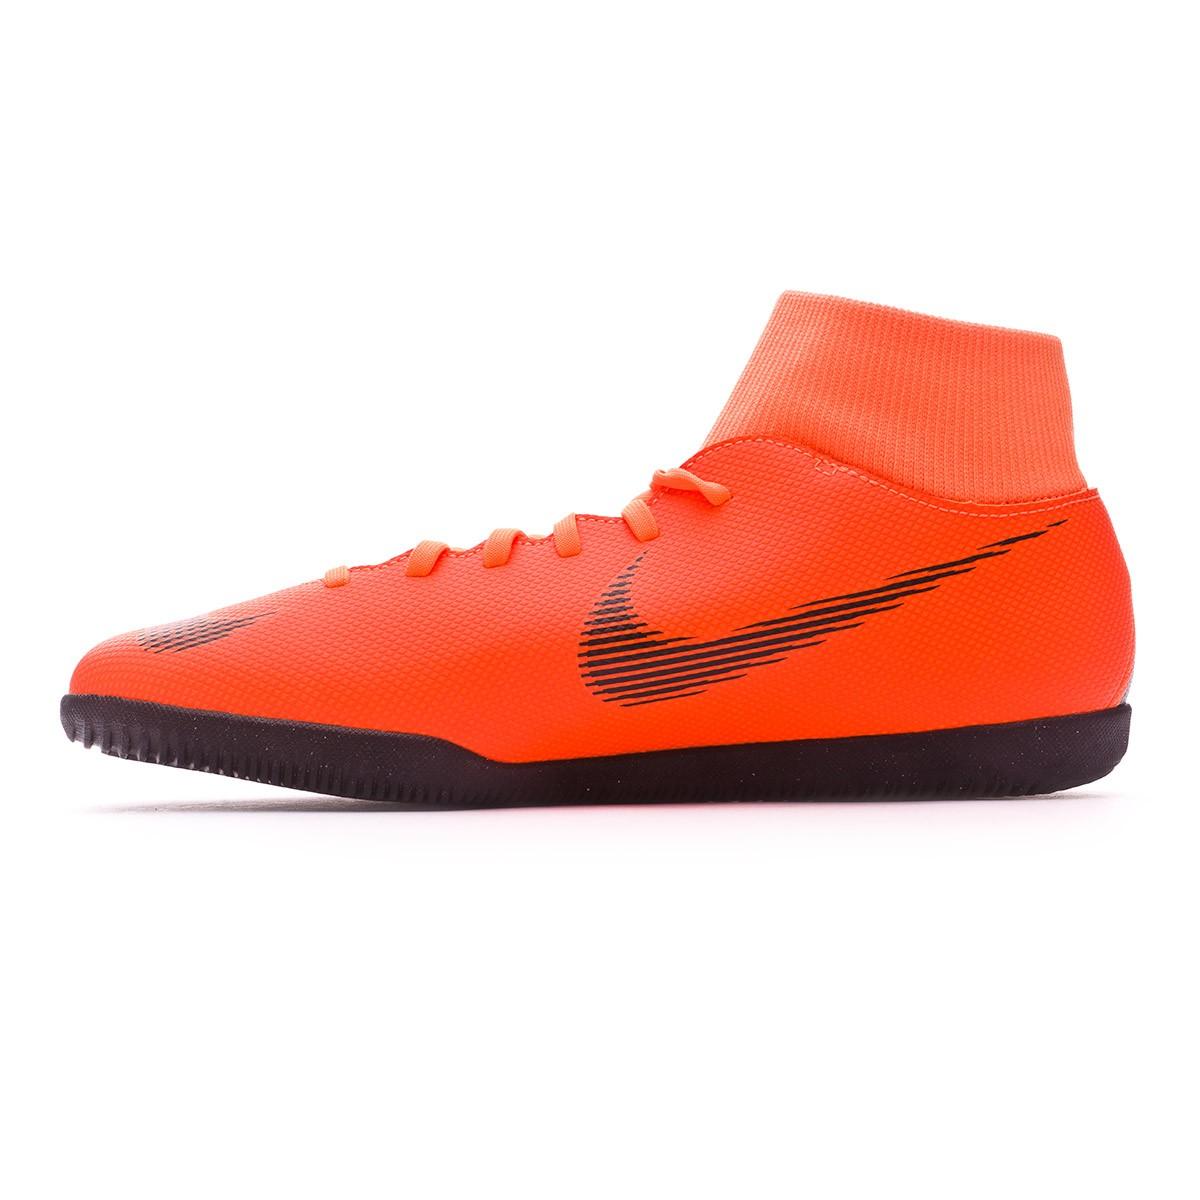 c9a263f833dc6 Zapatilla Nike Mercurial SuperflyX VI Club IC Total orange-Black-Volt -  Tienda de fútbol Fútbol Emotion